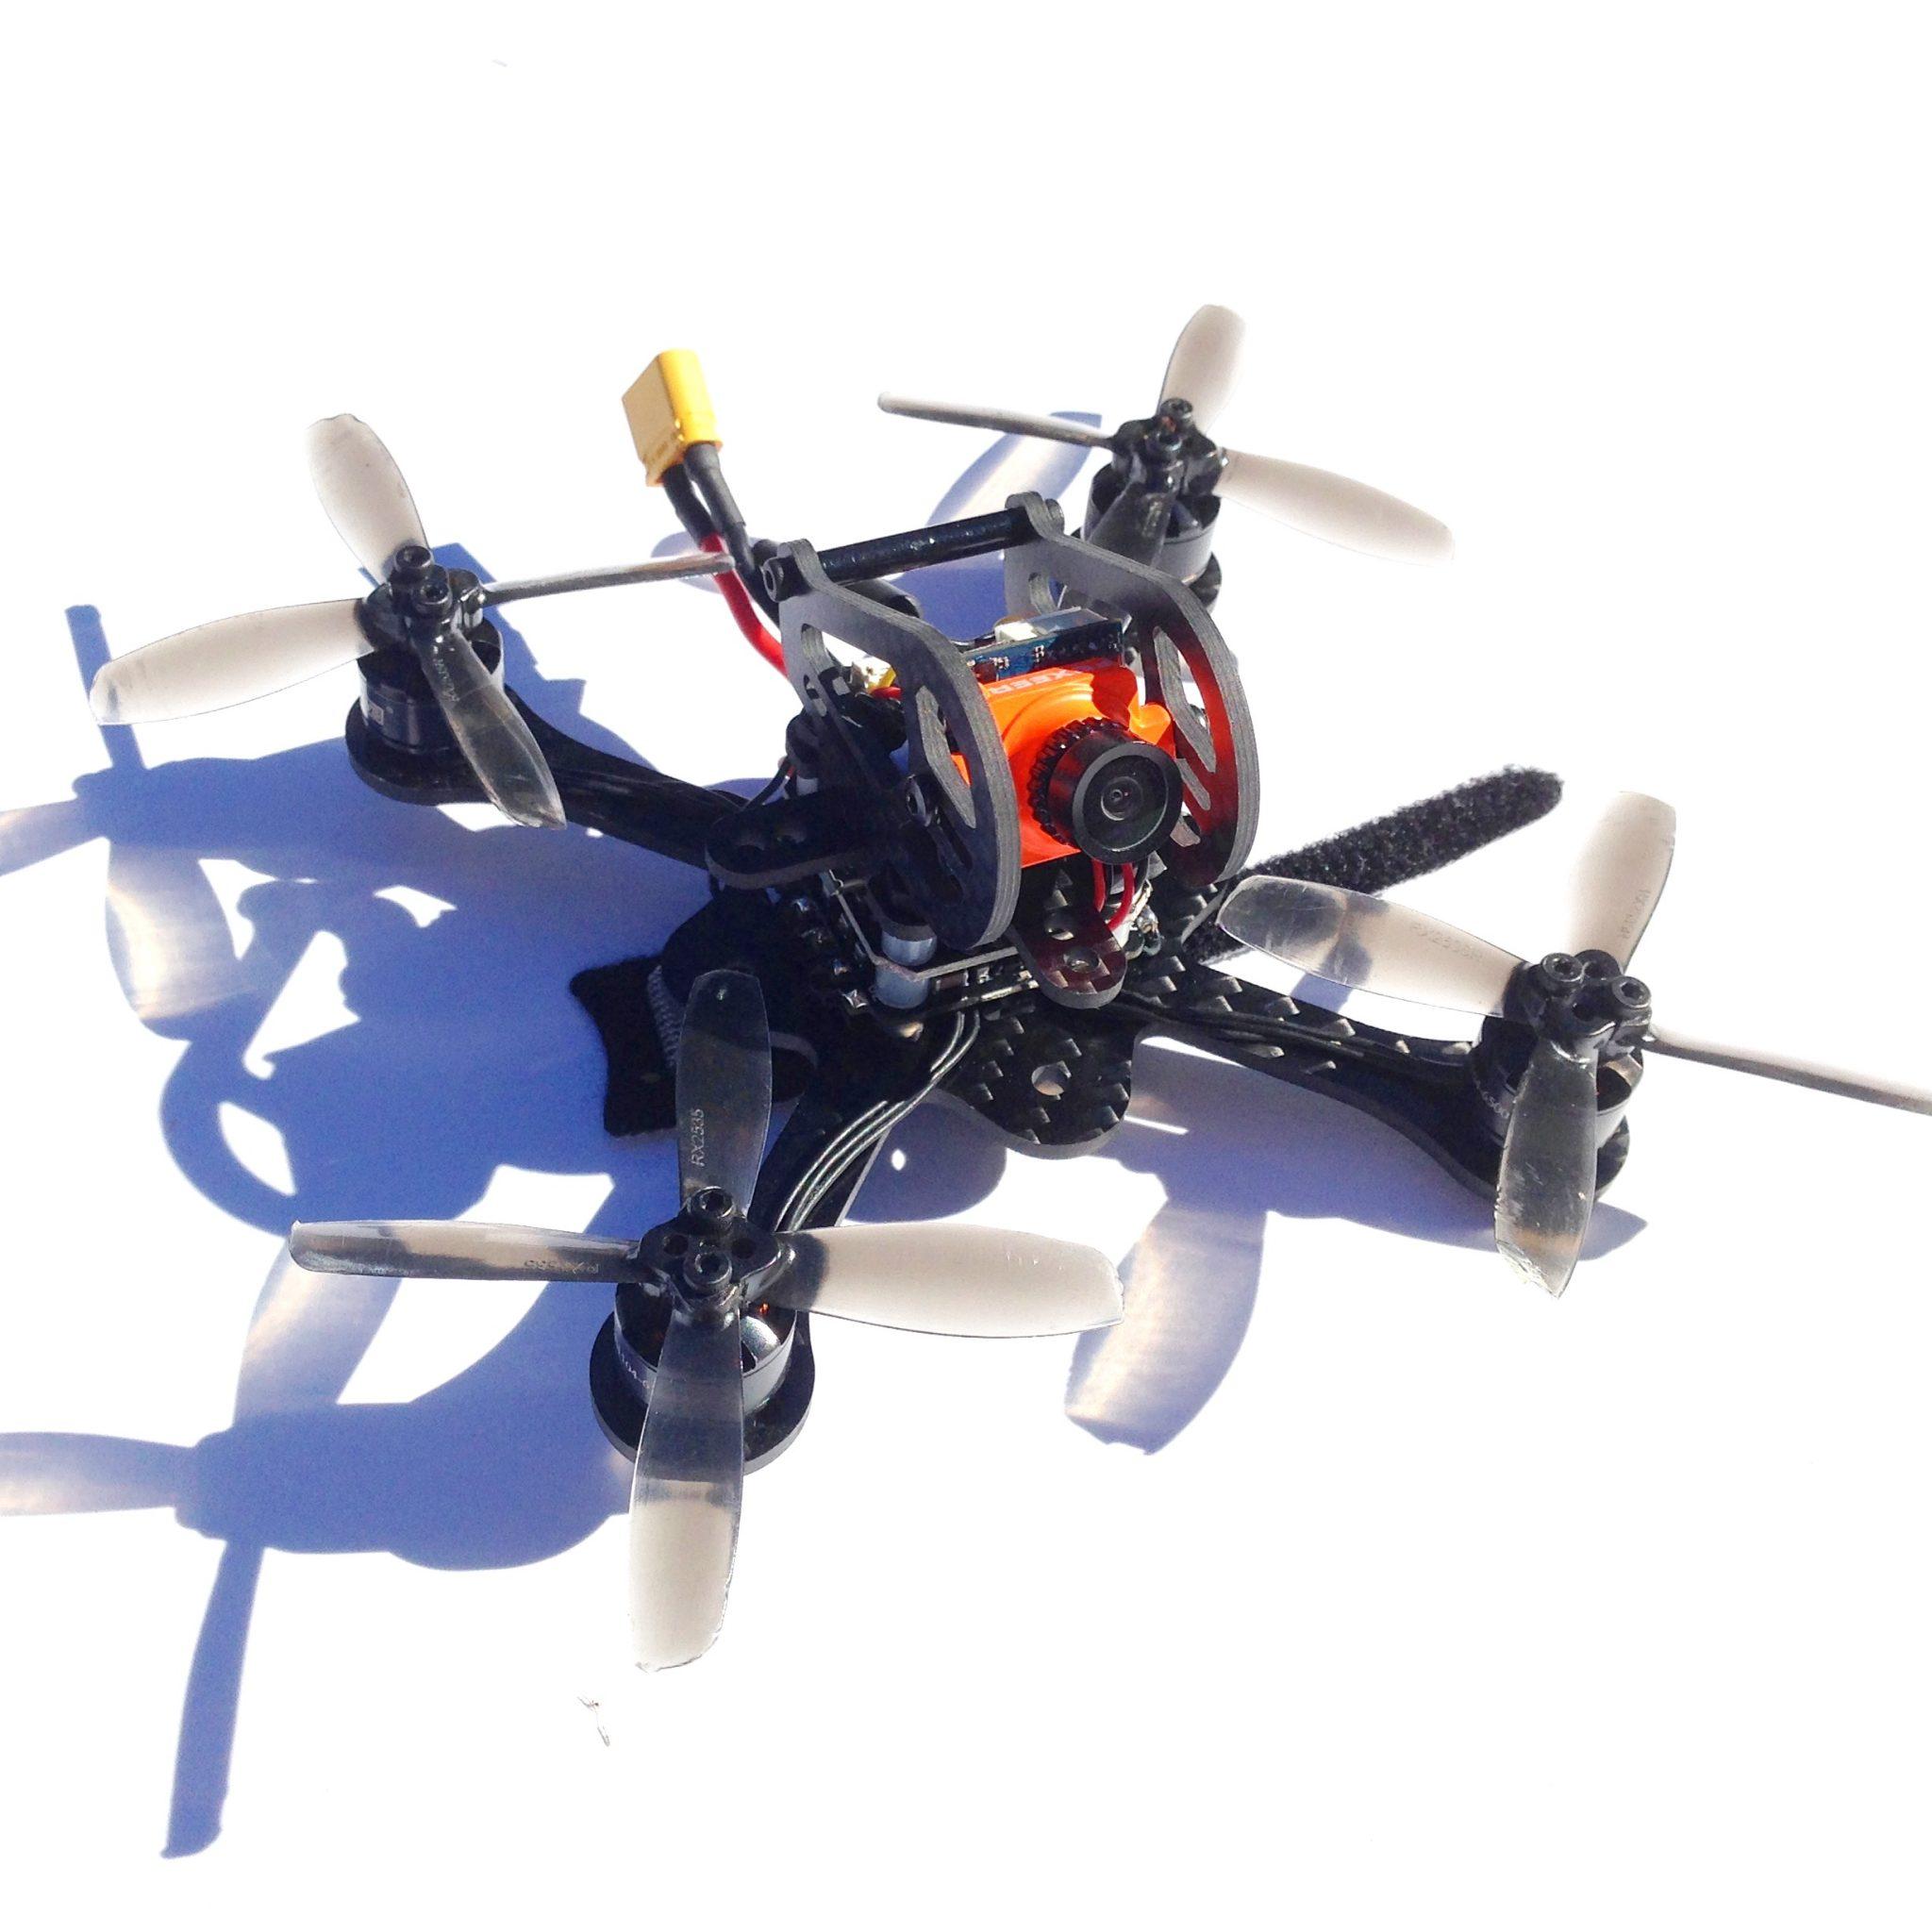 fpv racing drone